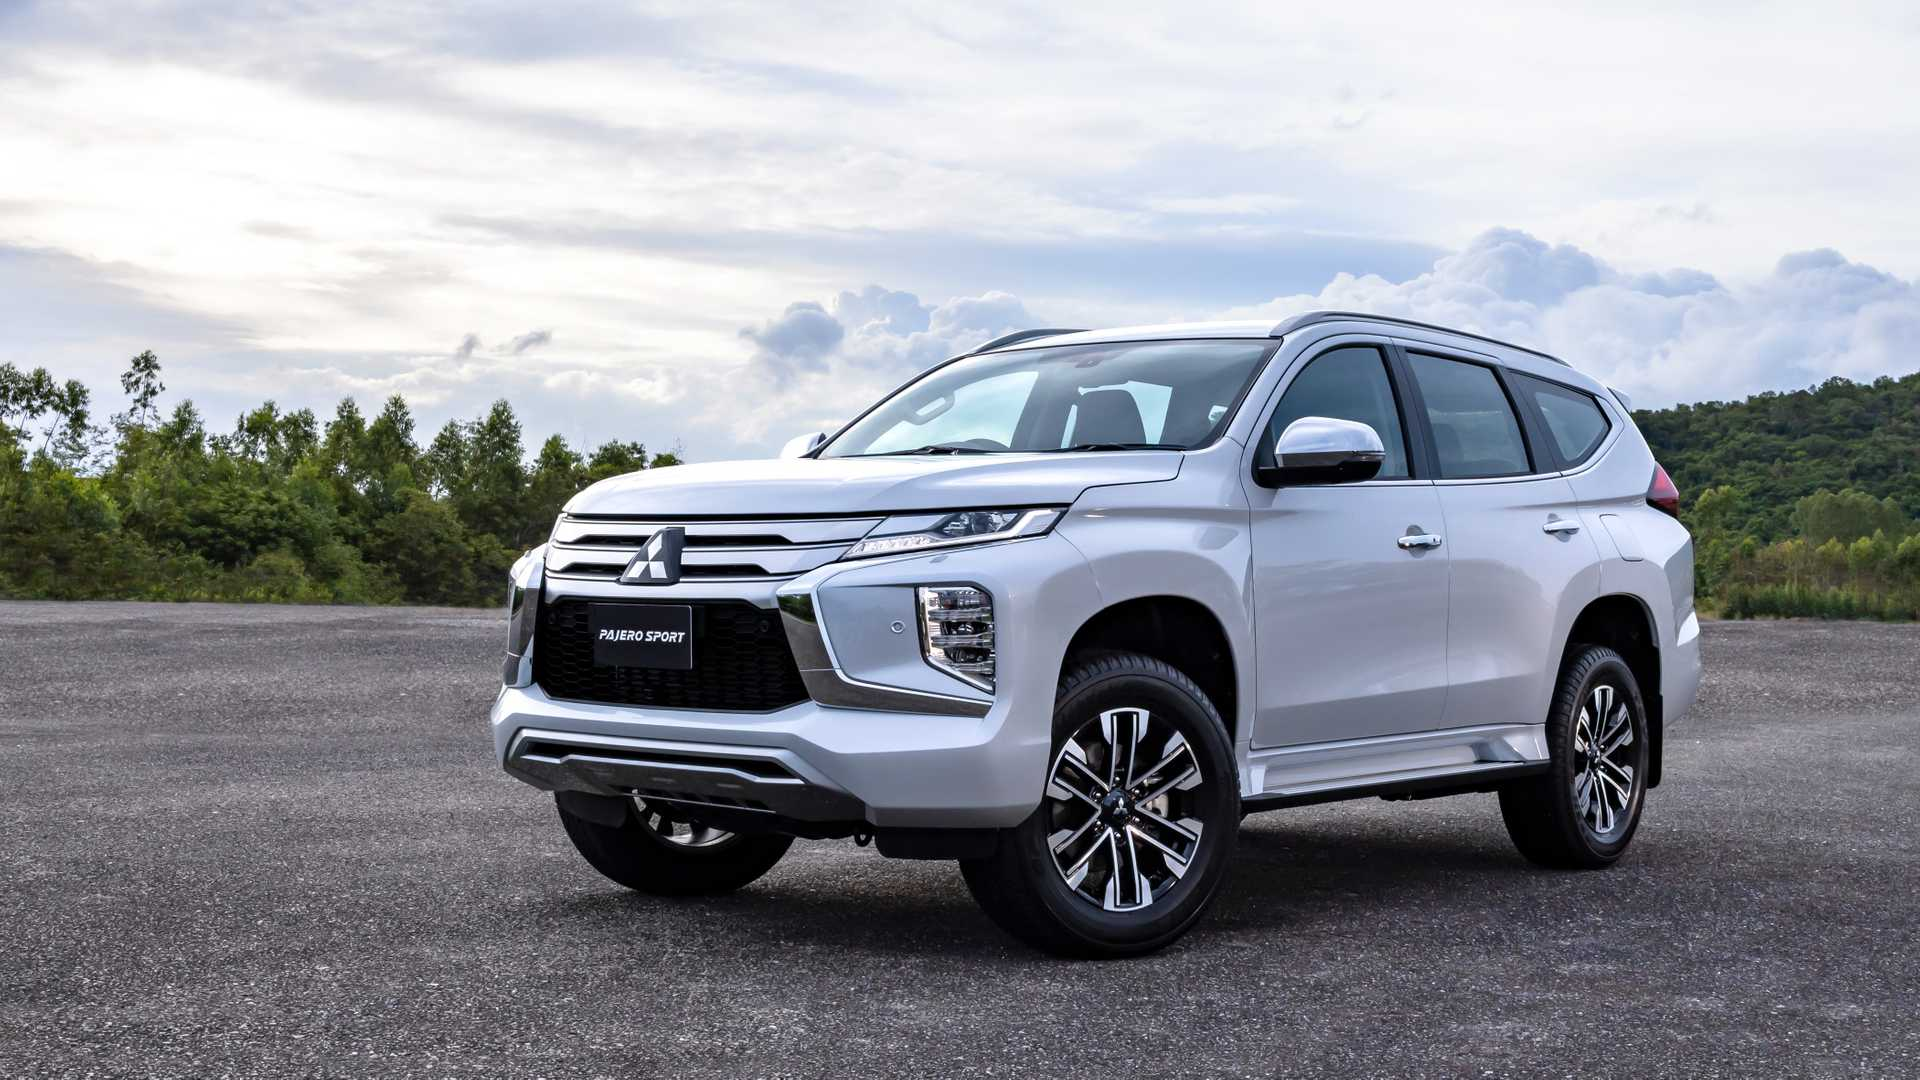 2020 Mitsubishi Montero Limited Price, Specs, Redesign, And Engines >> 2020 Mitsubishi Pajero Sport Gets Fresh Face Updated Interior